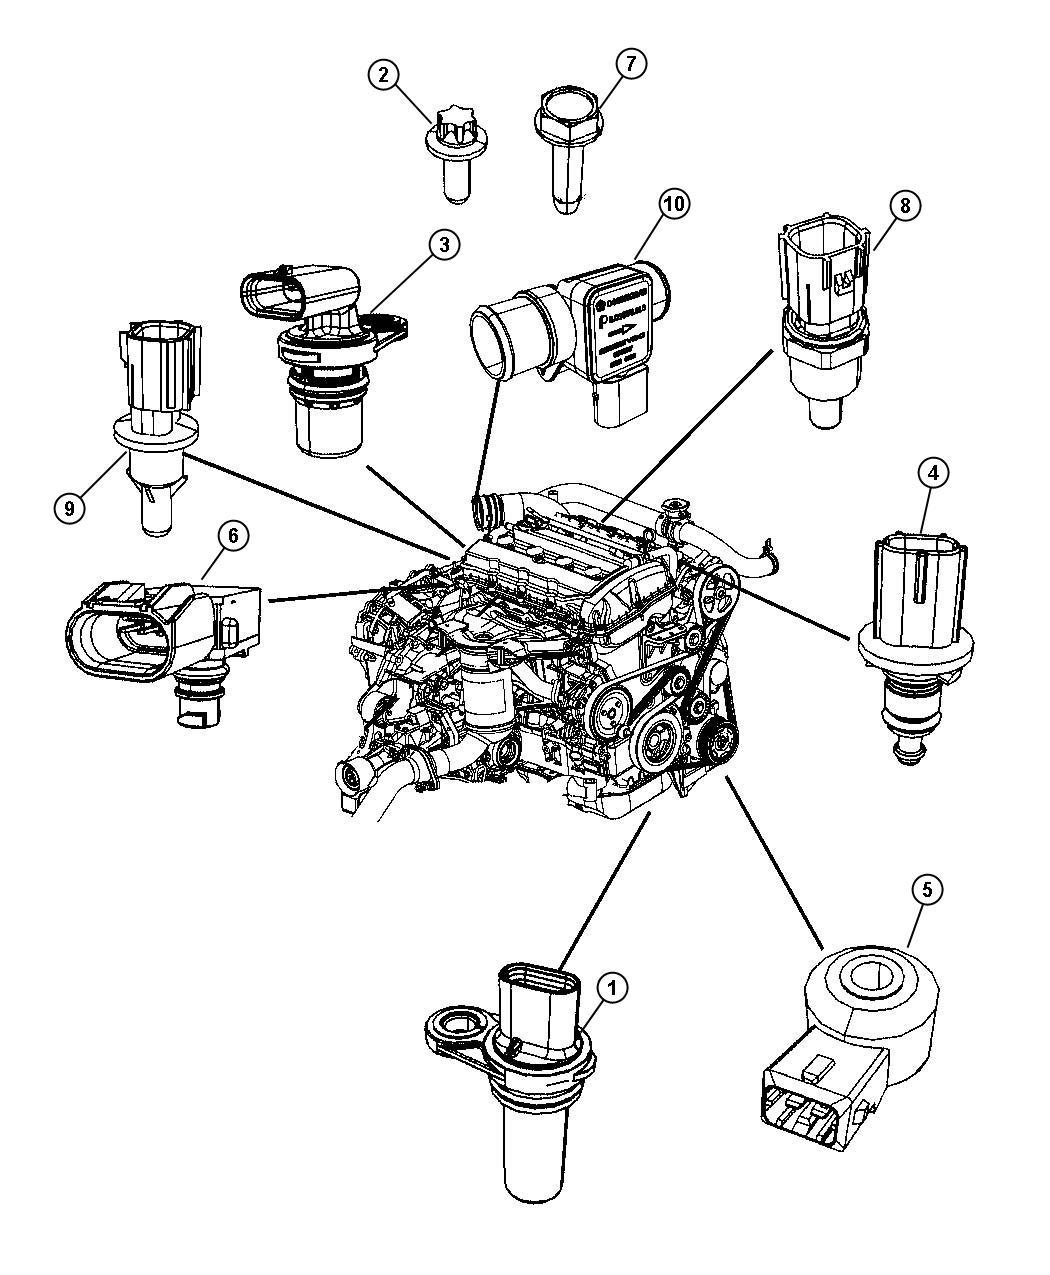 2017 Dodge Journey Sensor. Crankshaft position. Vehicle